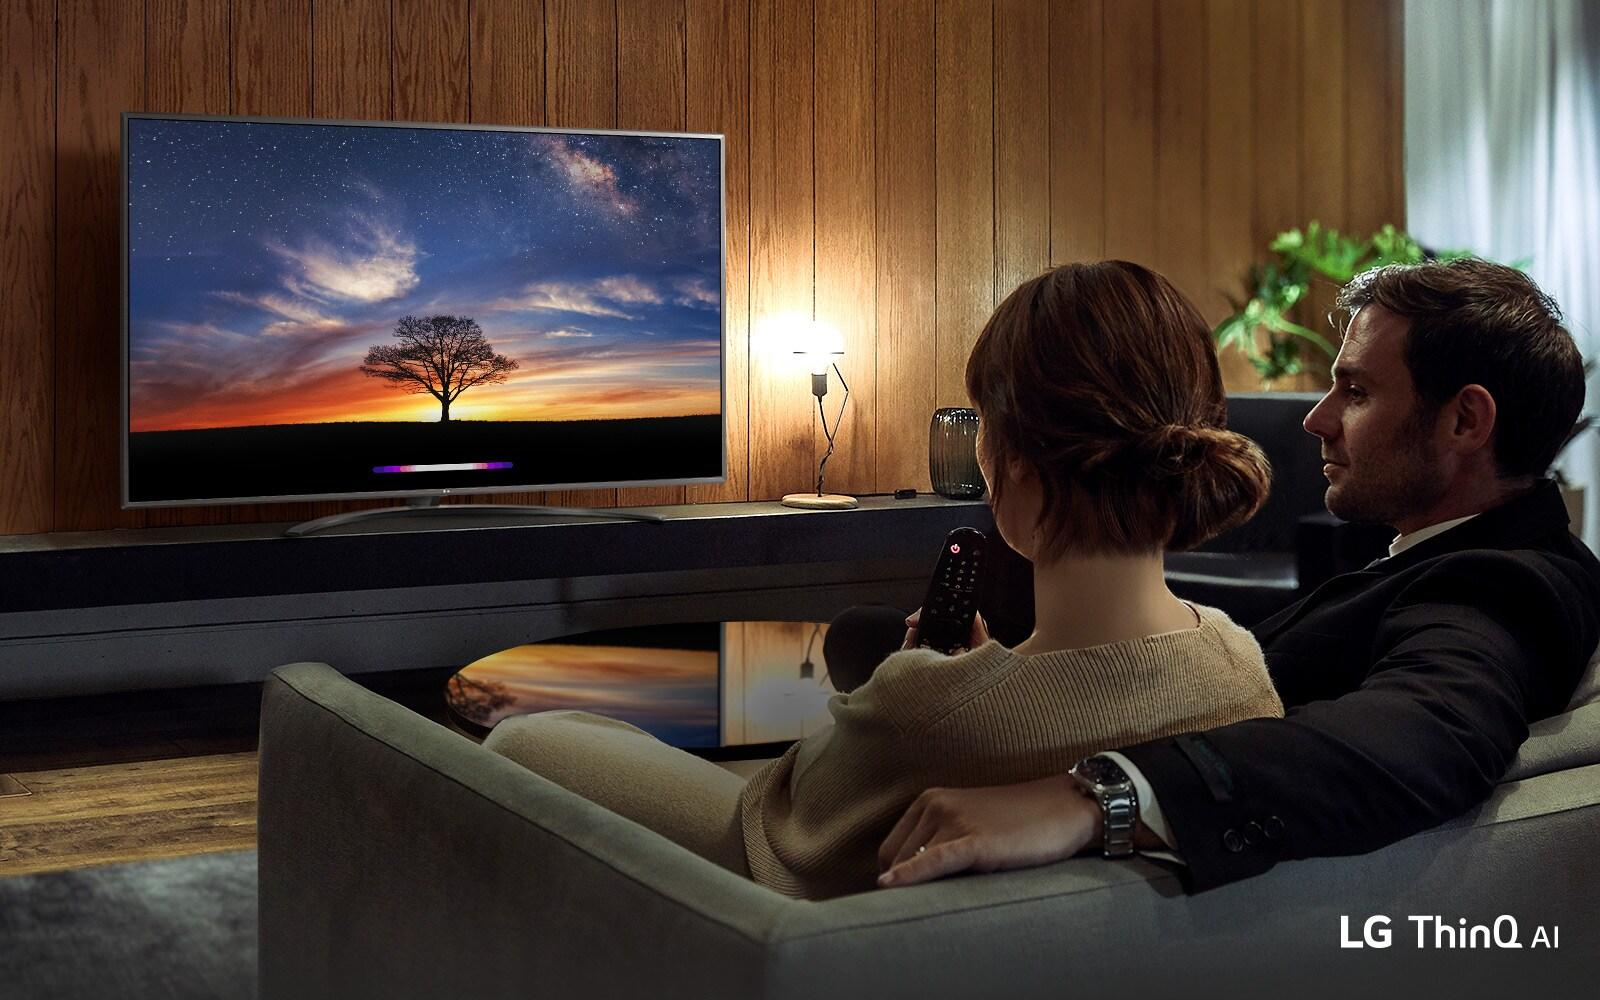 TV-UHD-65-55-UM76-01-AI-ThinQ-Desktop